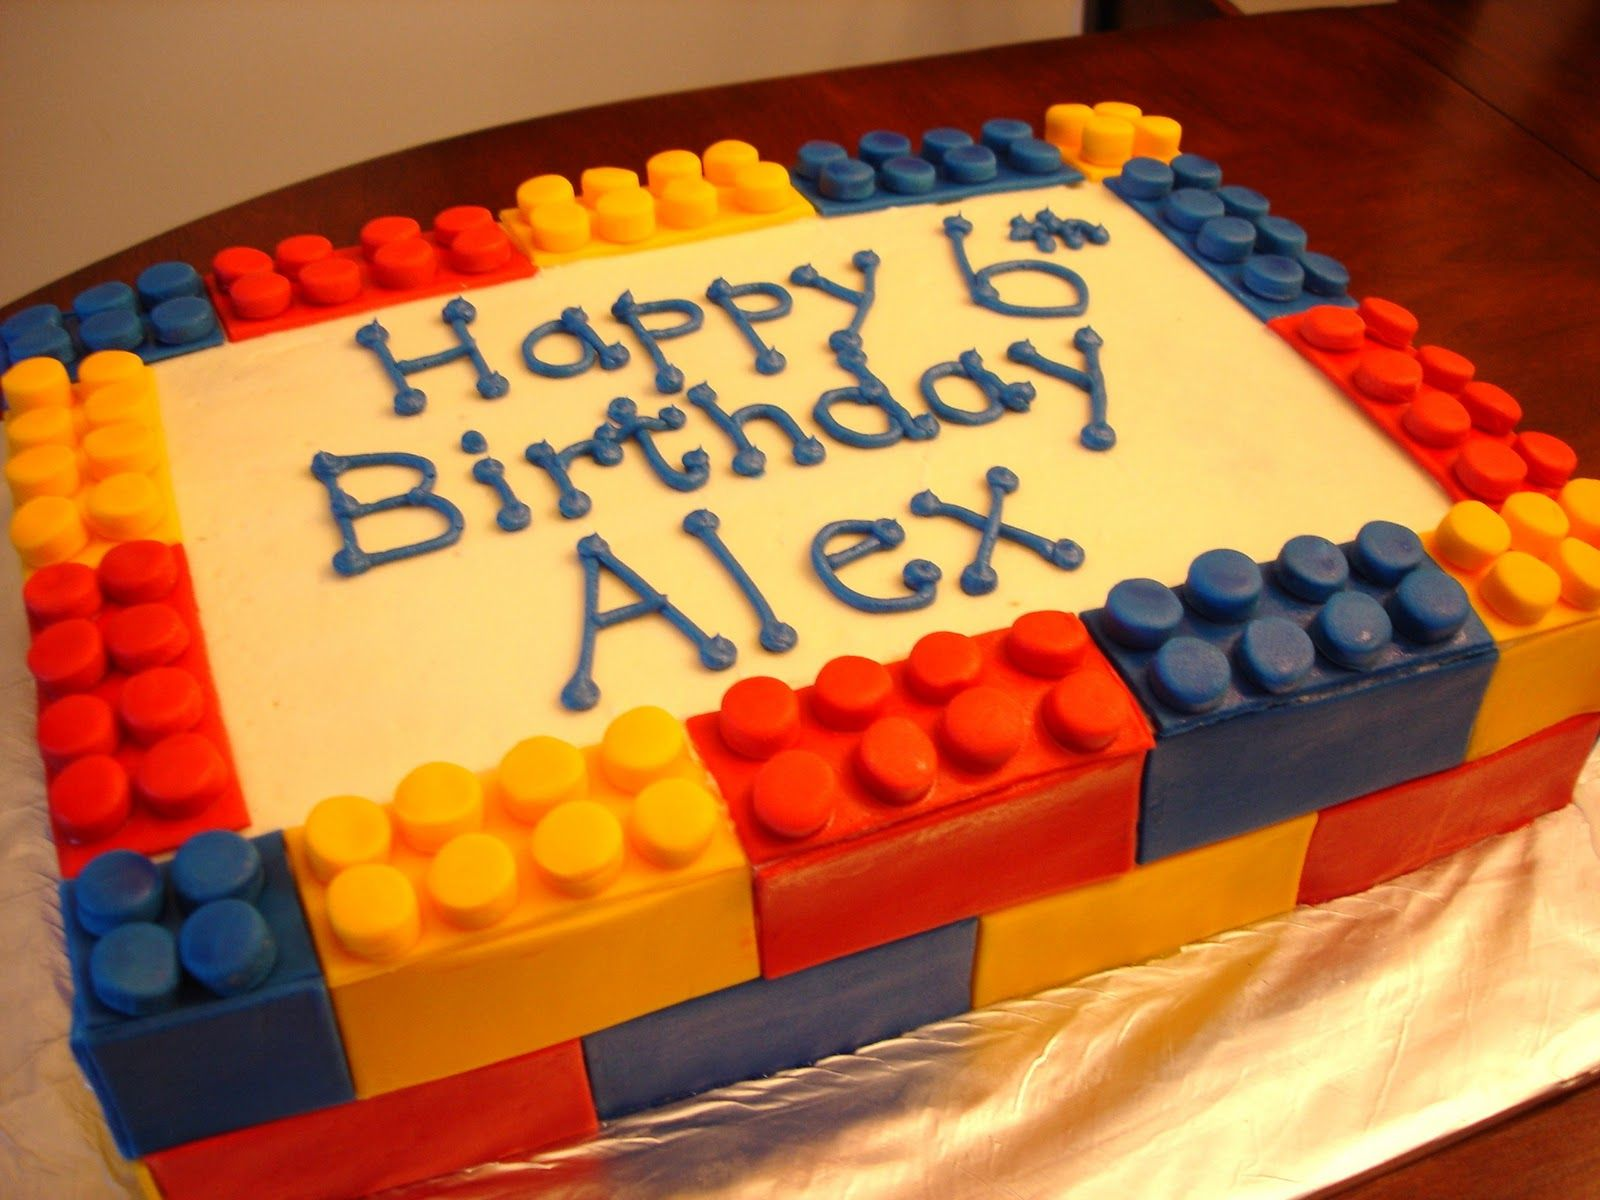 Google Image Result For HttpbpblogspotcomkPMmAvk - Lego birthday cake decorations